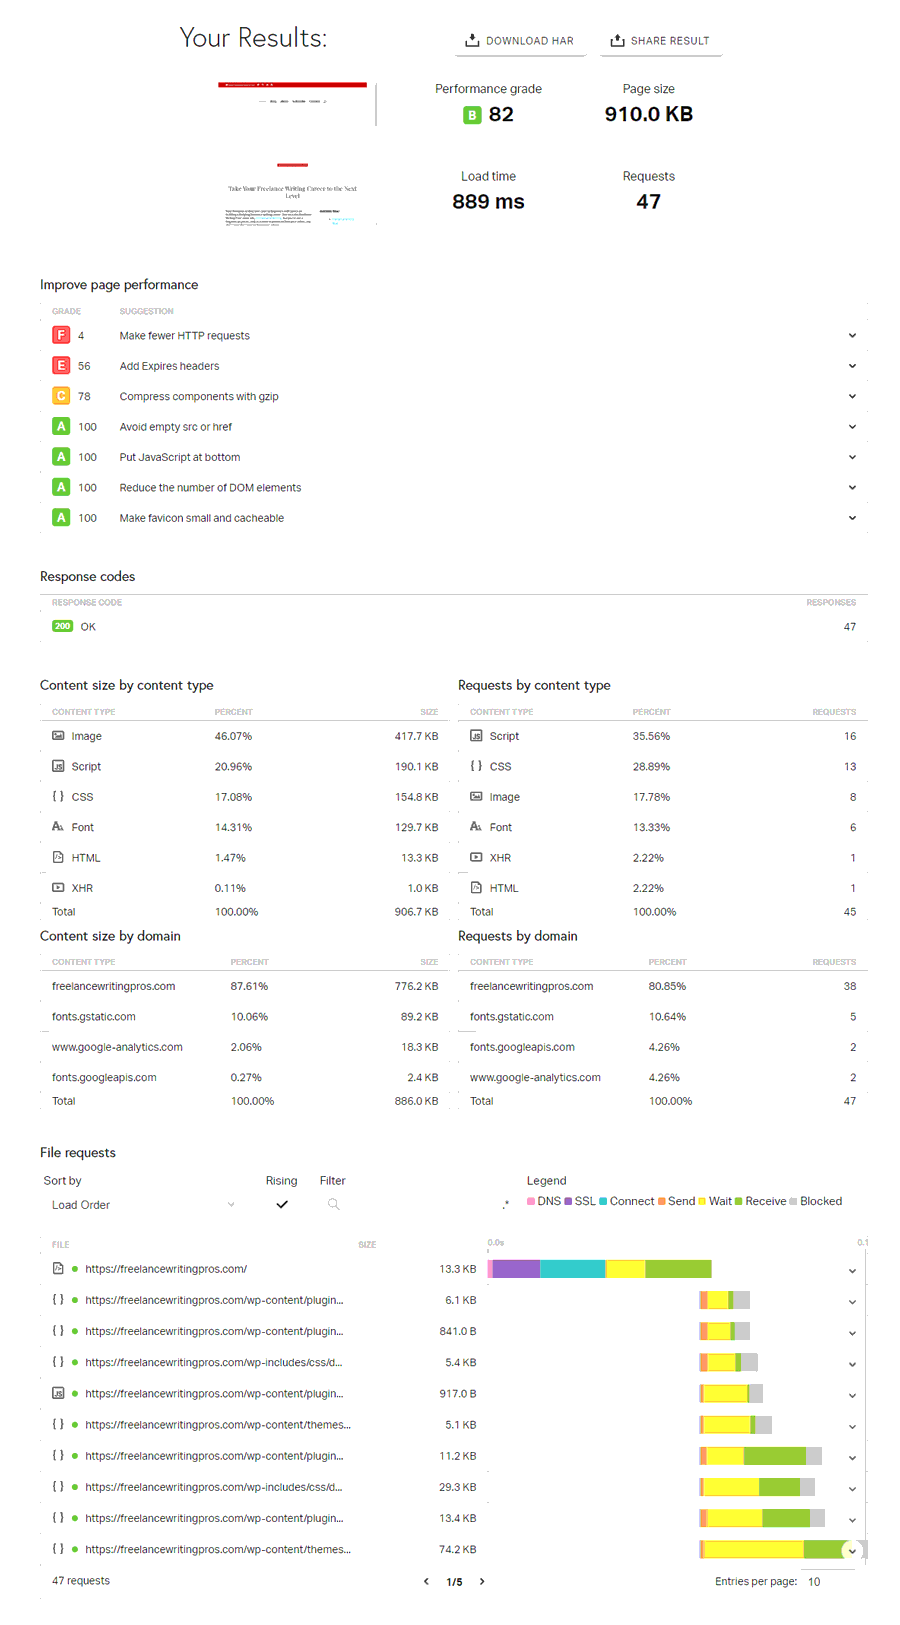 Website speed test - Pingdom - FreelanceWritingPros.com